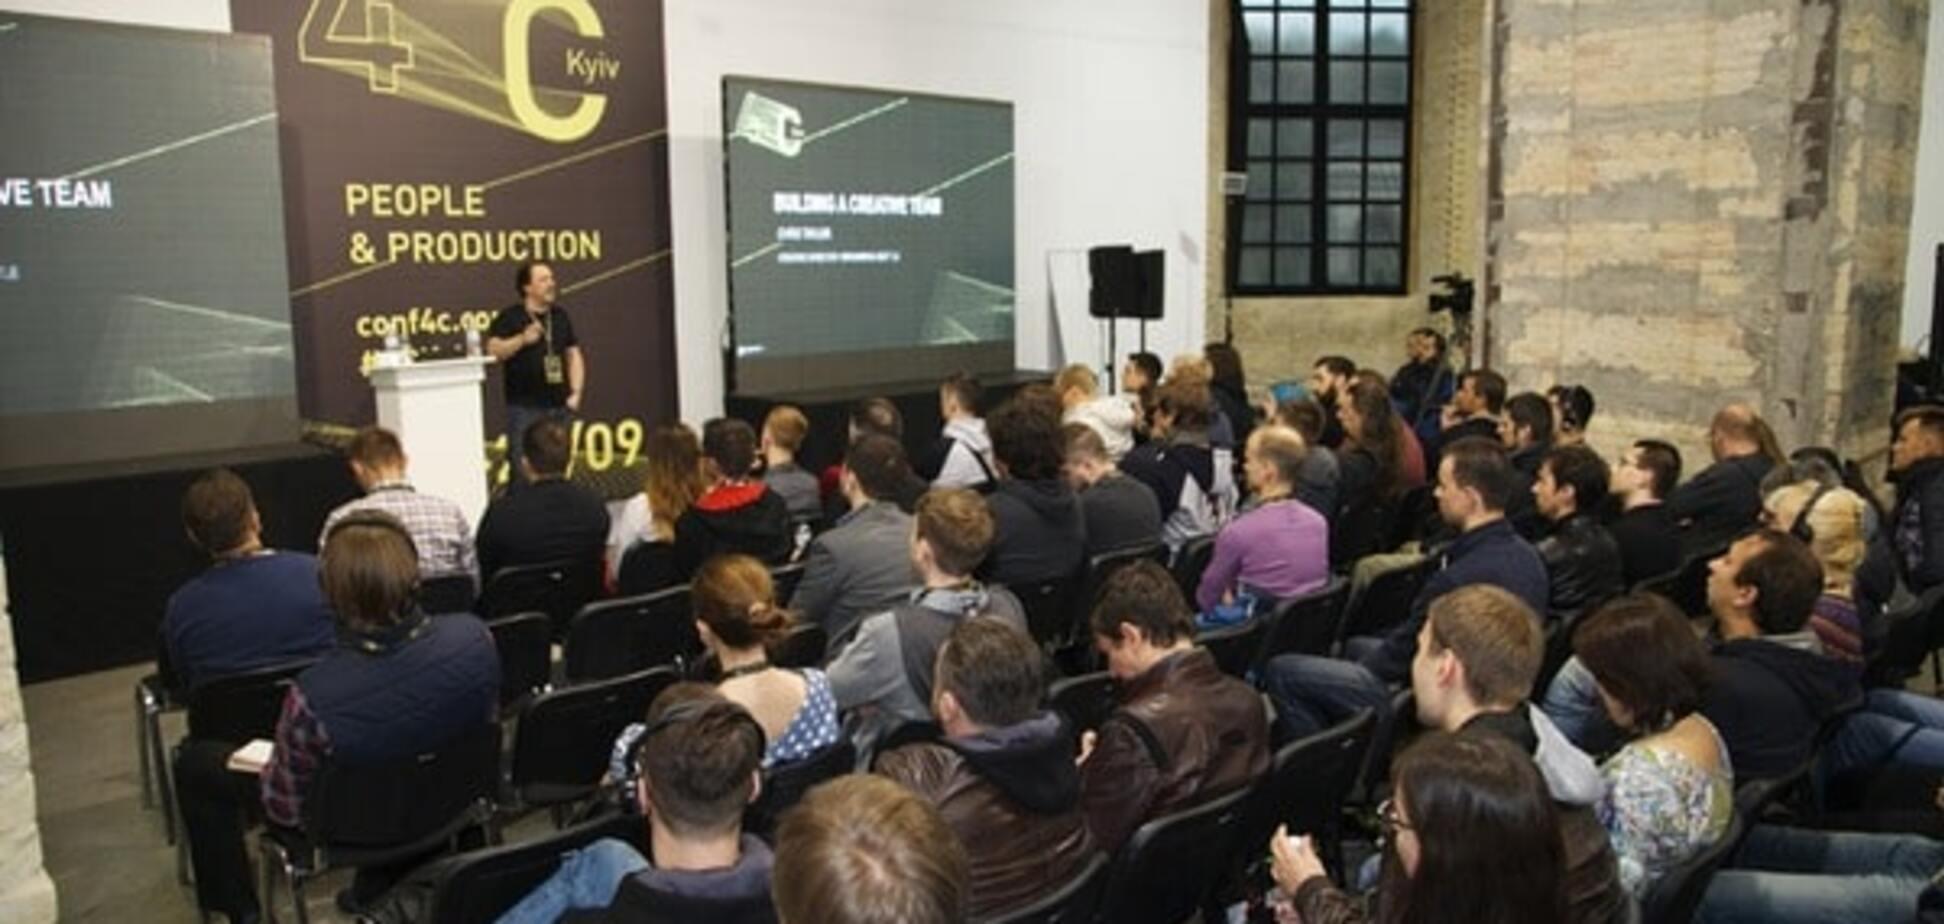 На конференции 4C: Kyiv собрались разработчики игр со всего мира